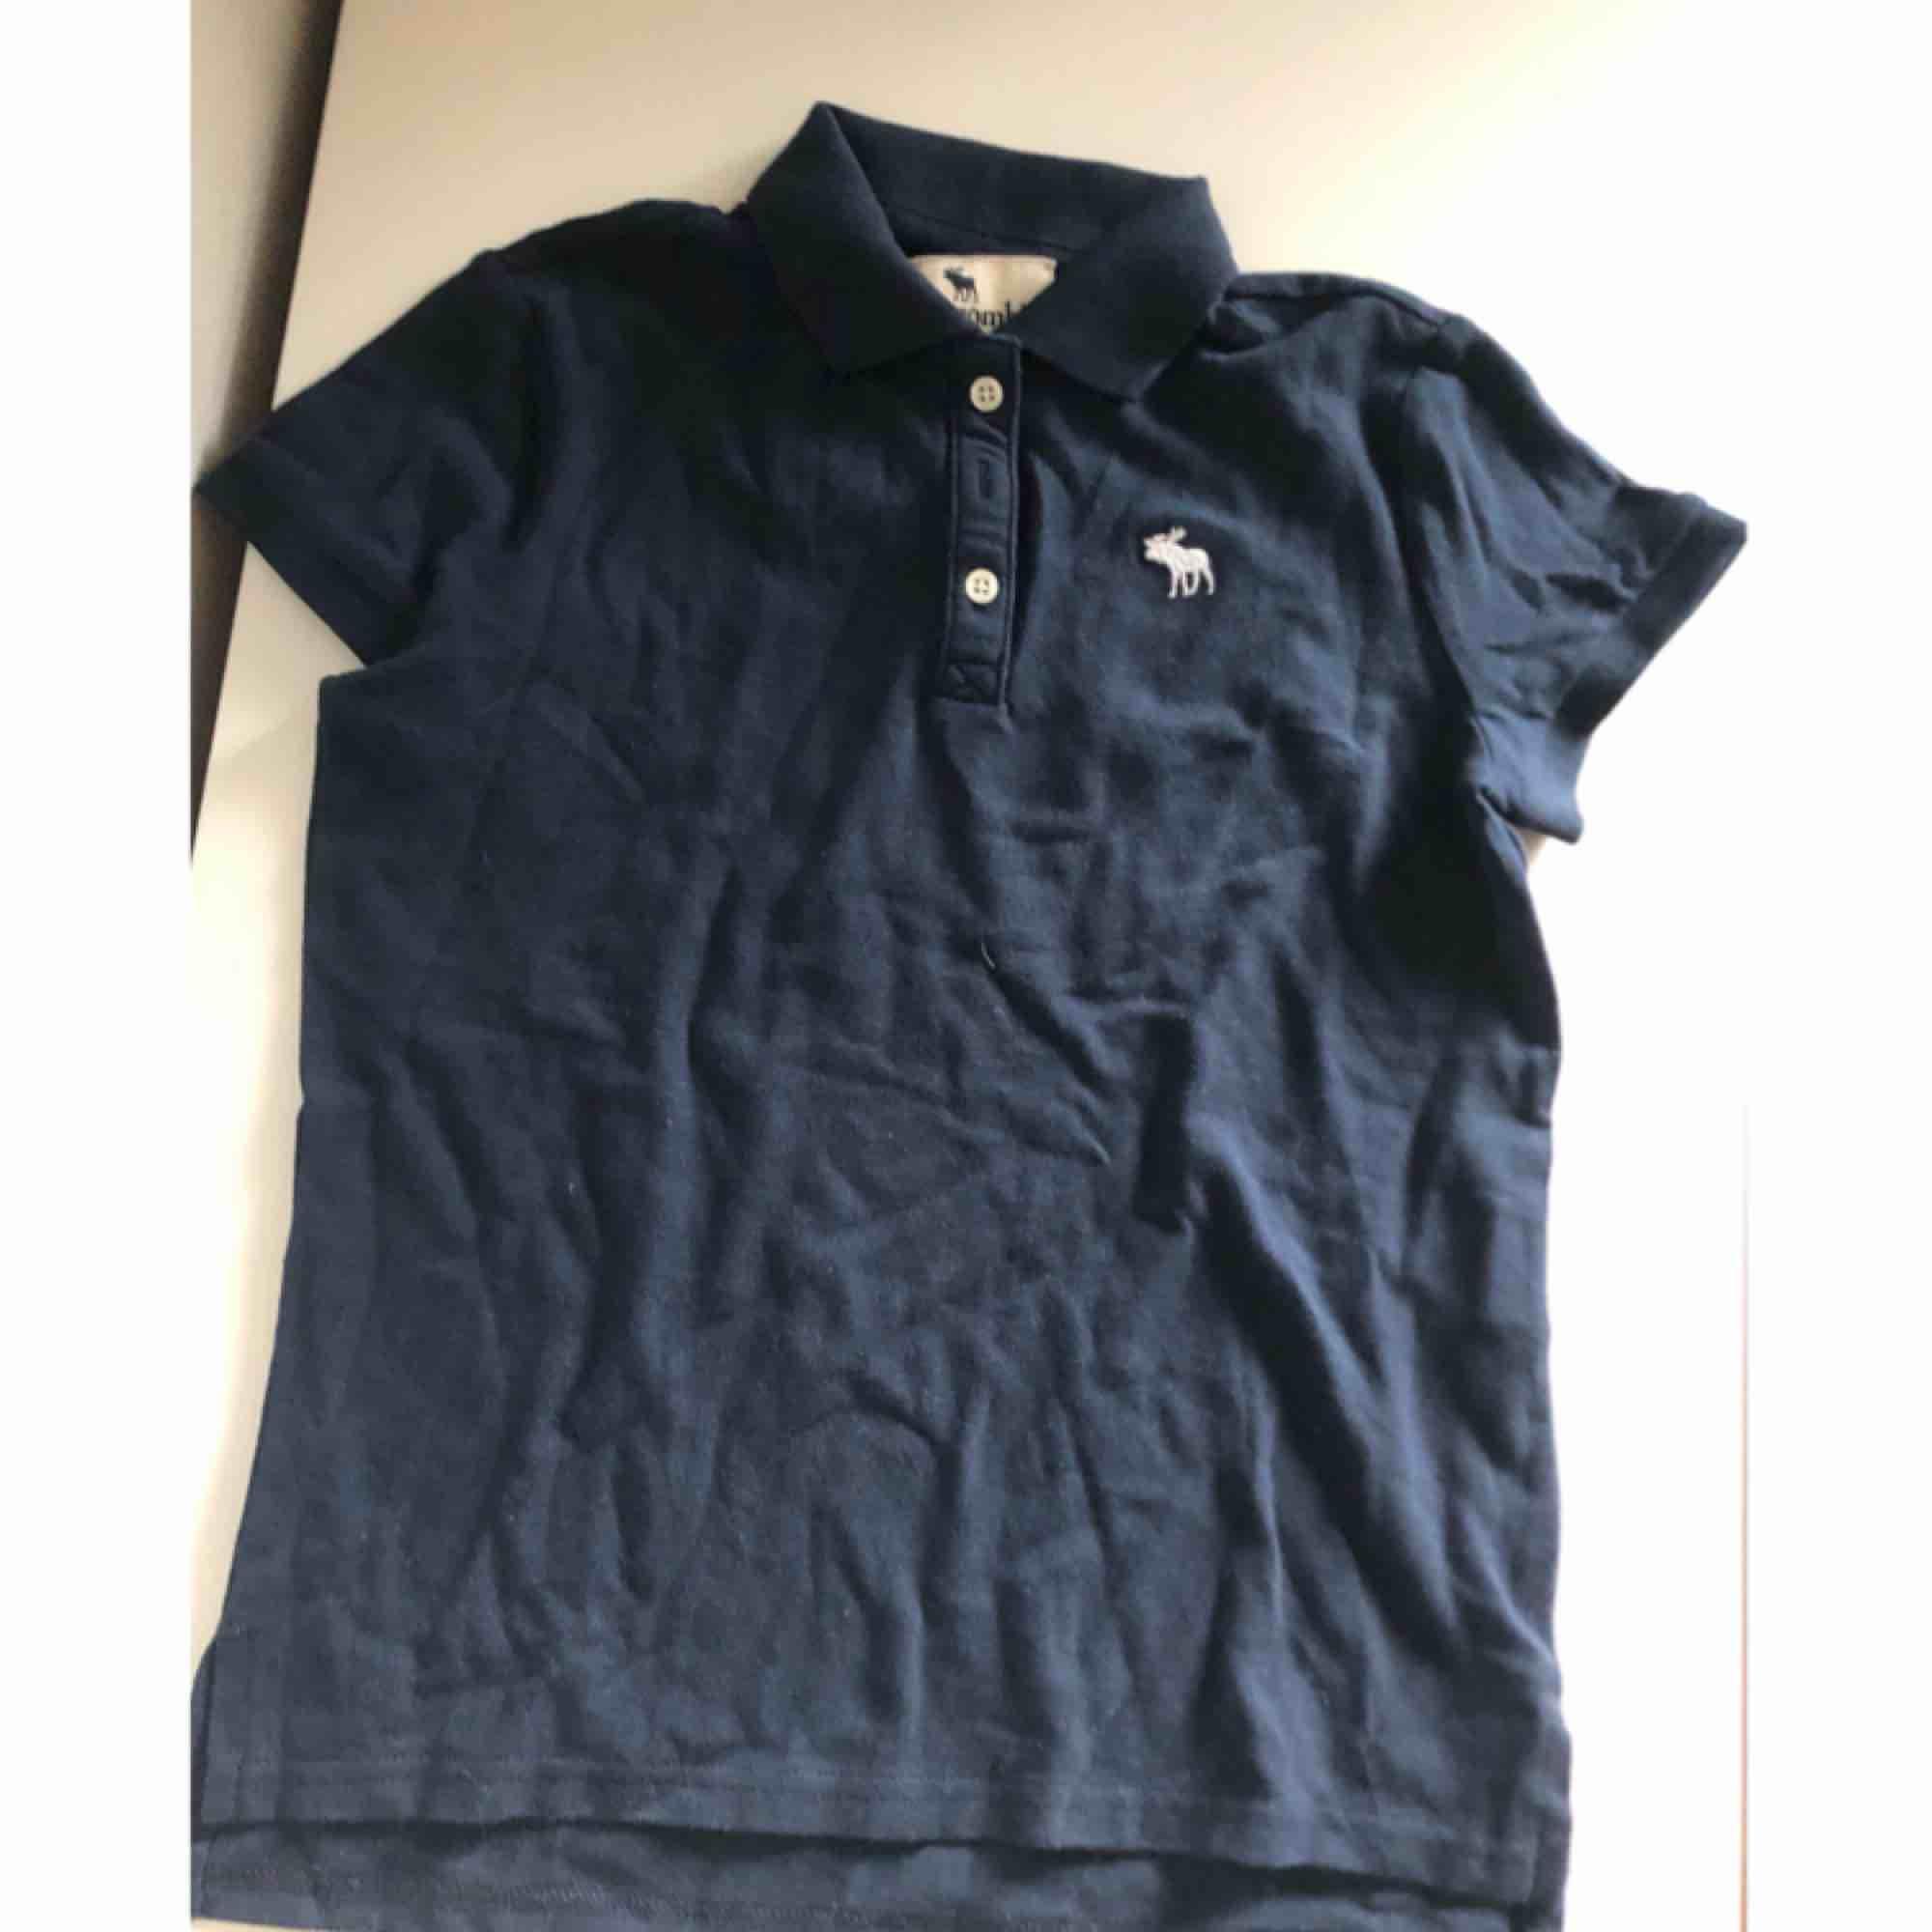 Pike tröja från abercrombie & fitch, storlek 9-10 år. Aldrig använd! . Skjortor.